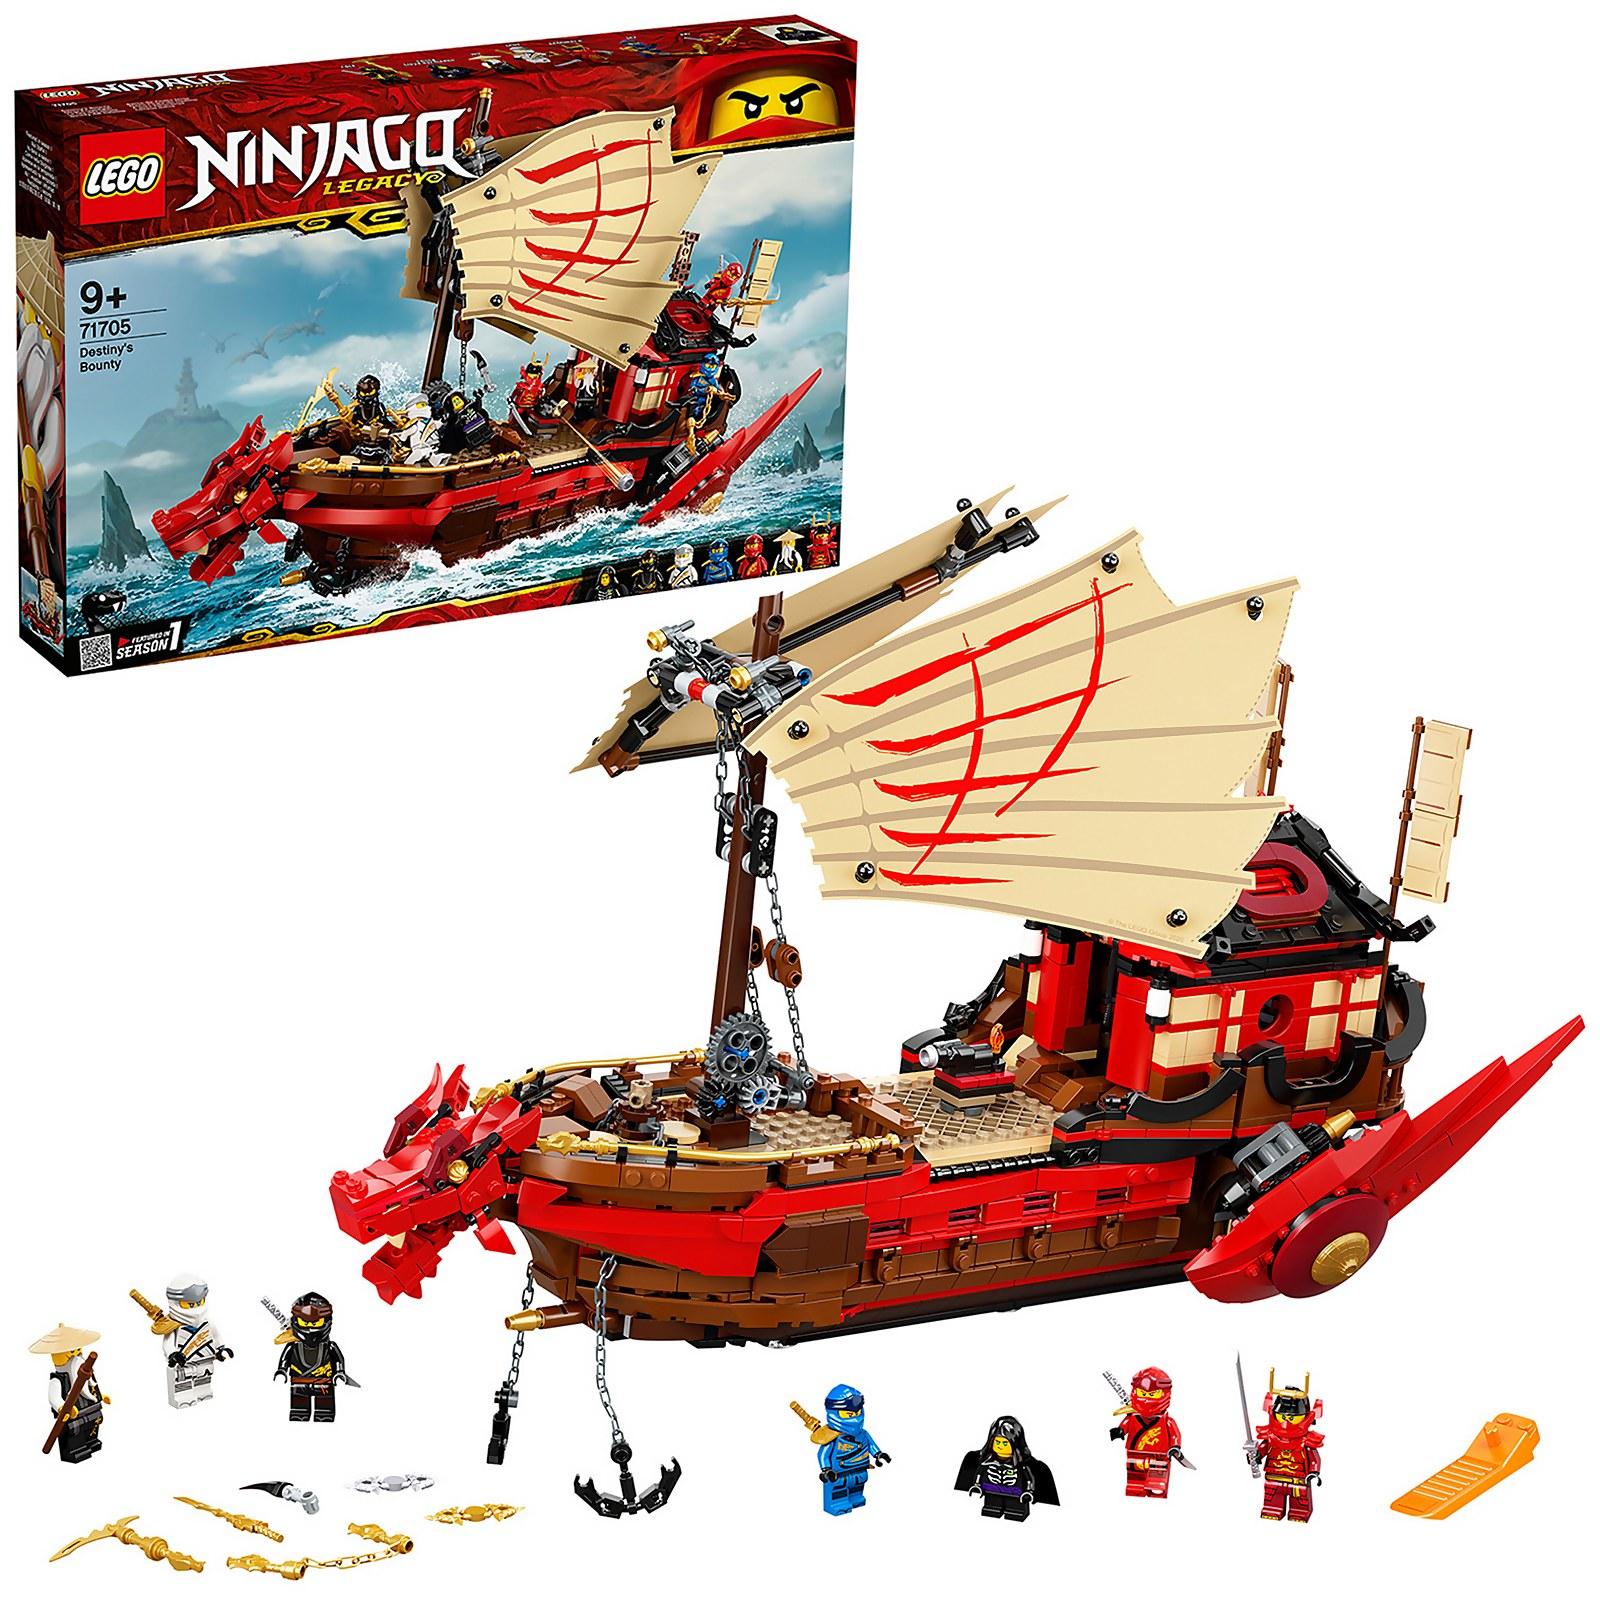 LEGO Ninjago Destinys Bounty (71705)